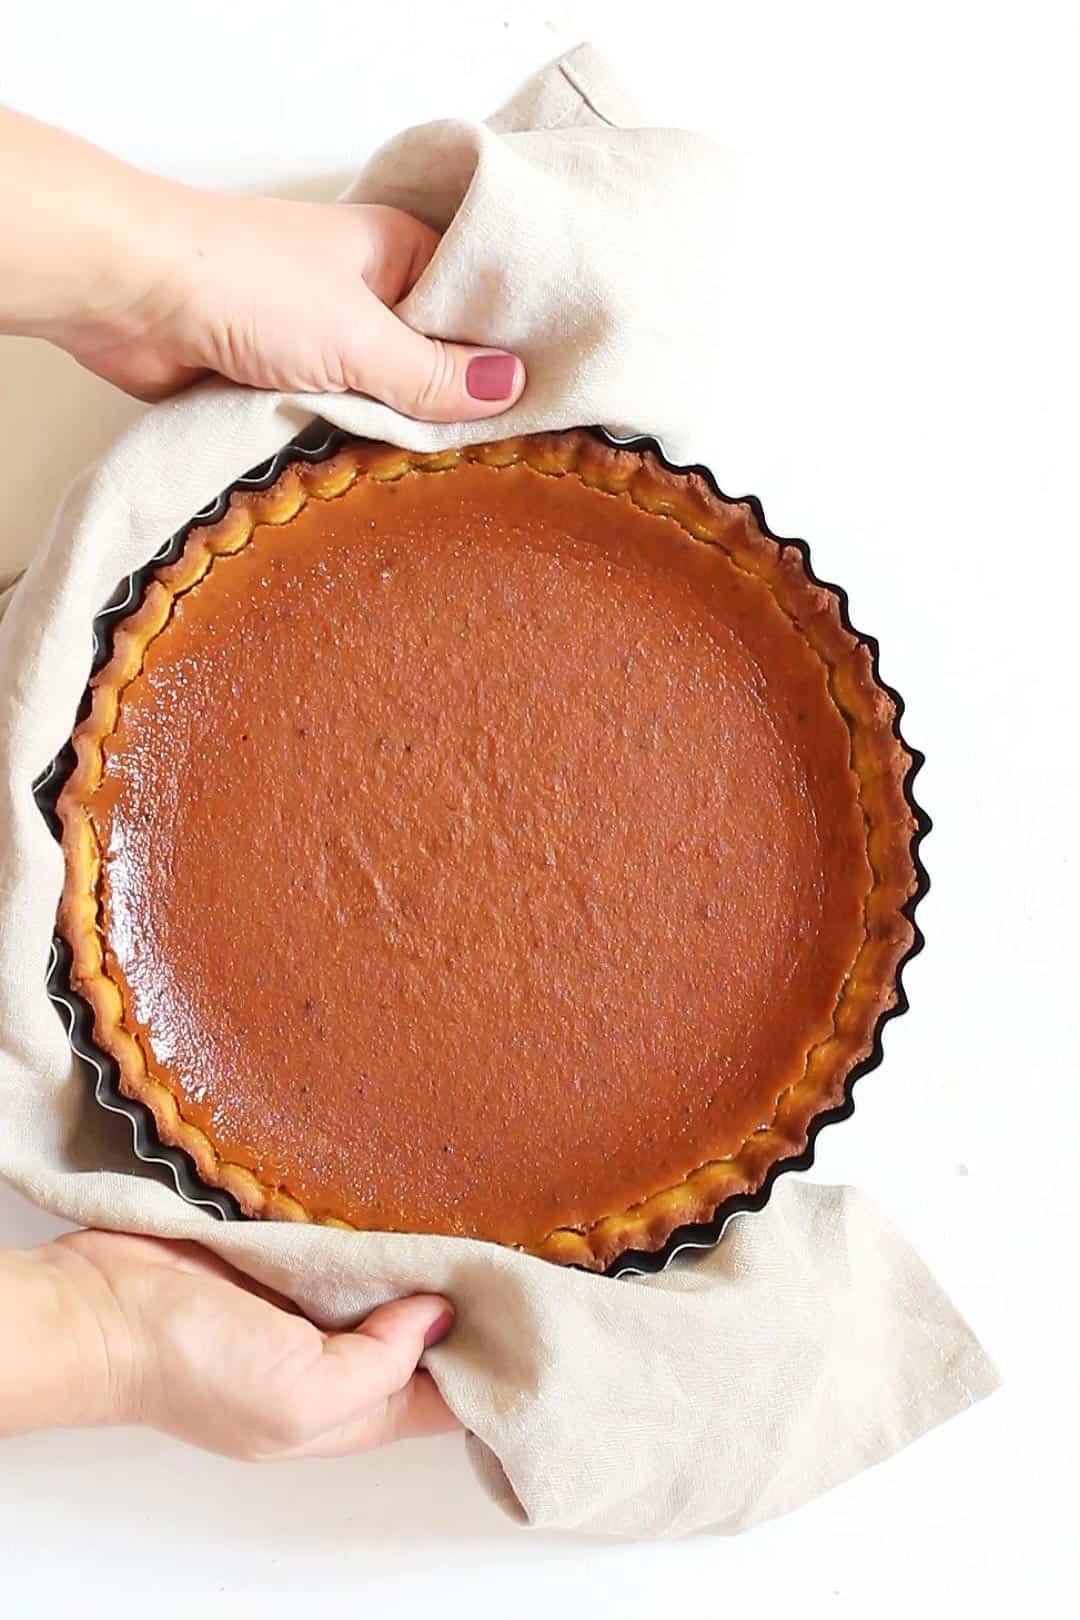 Holding Keto Pumpkin Pie